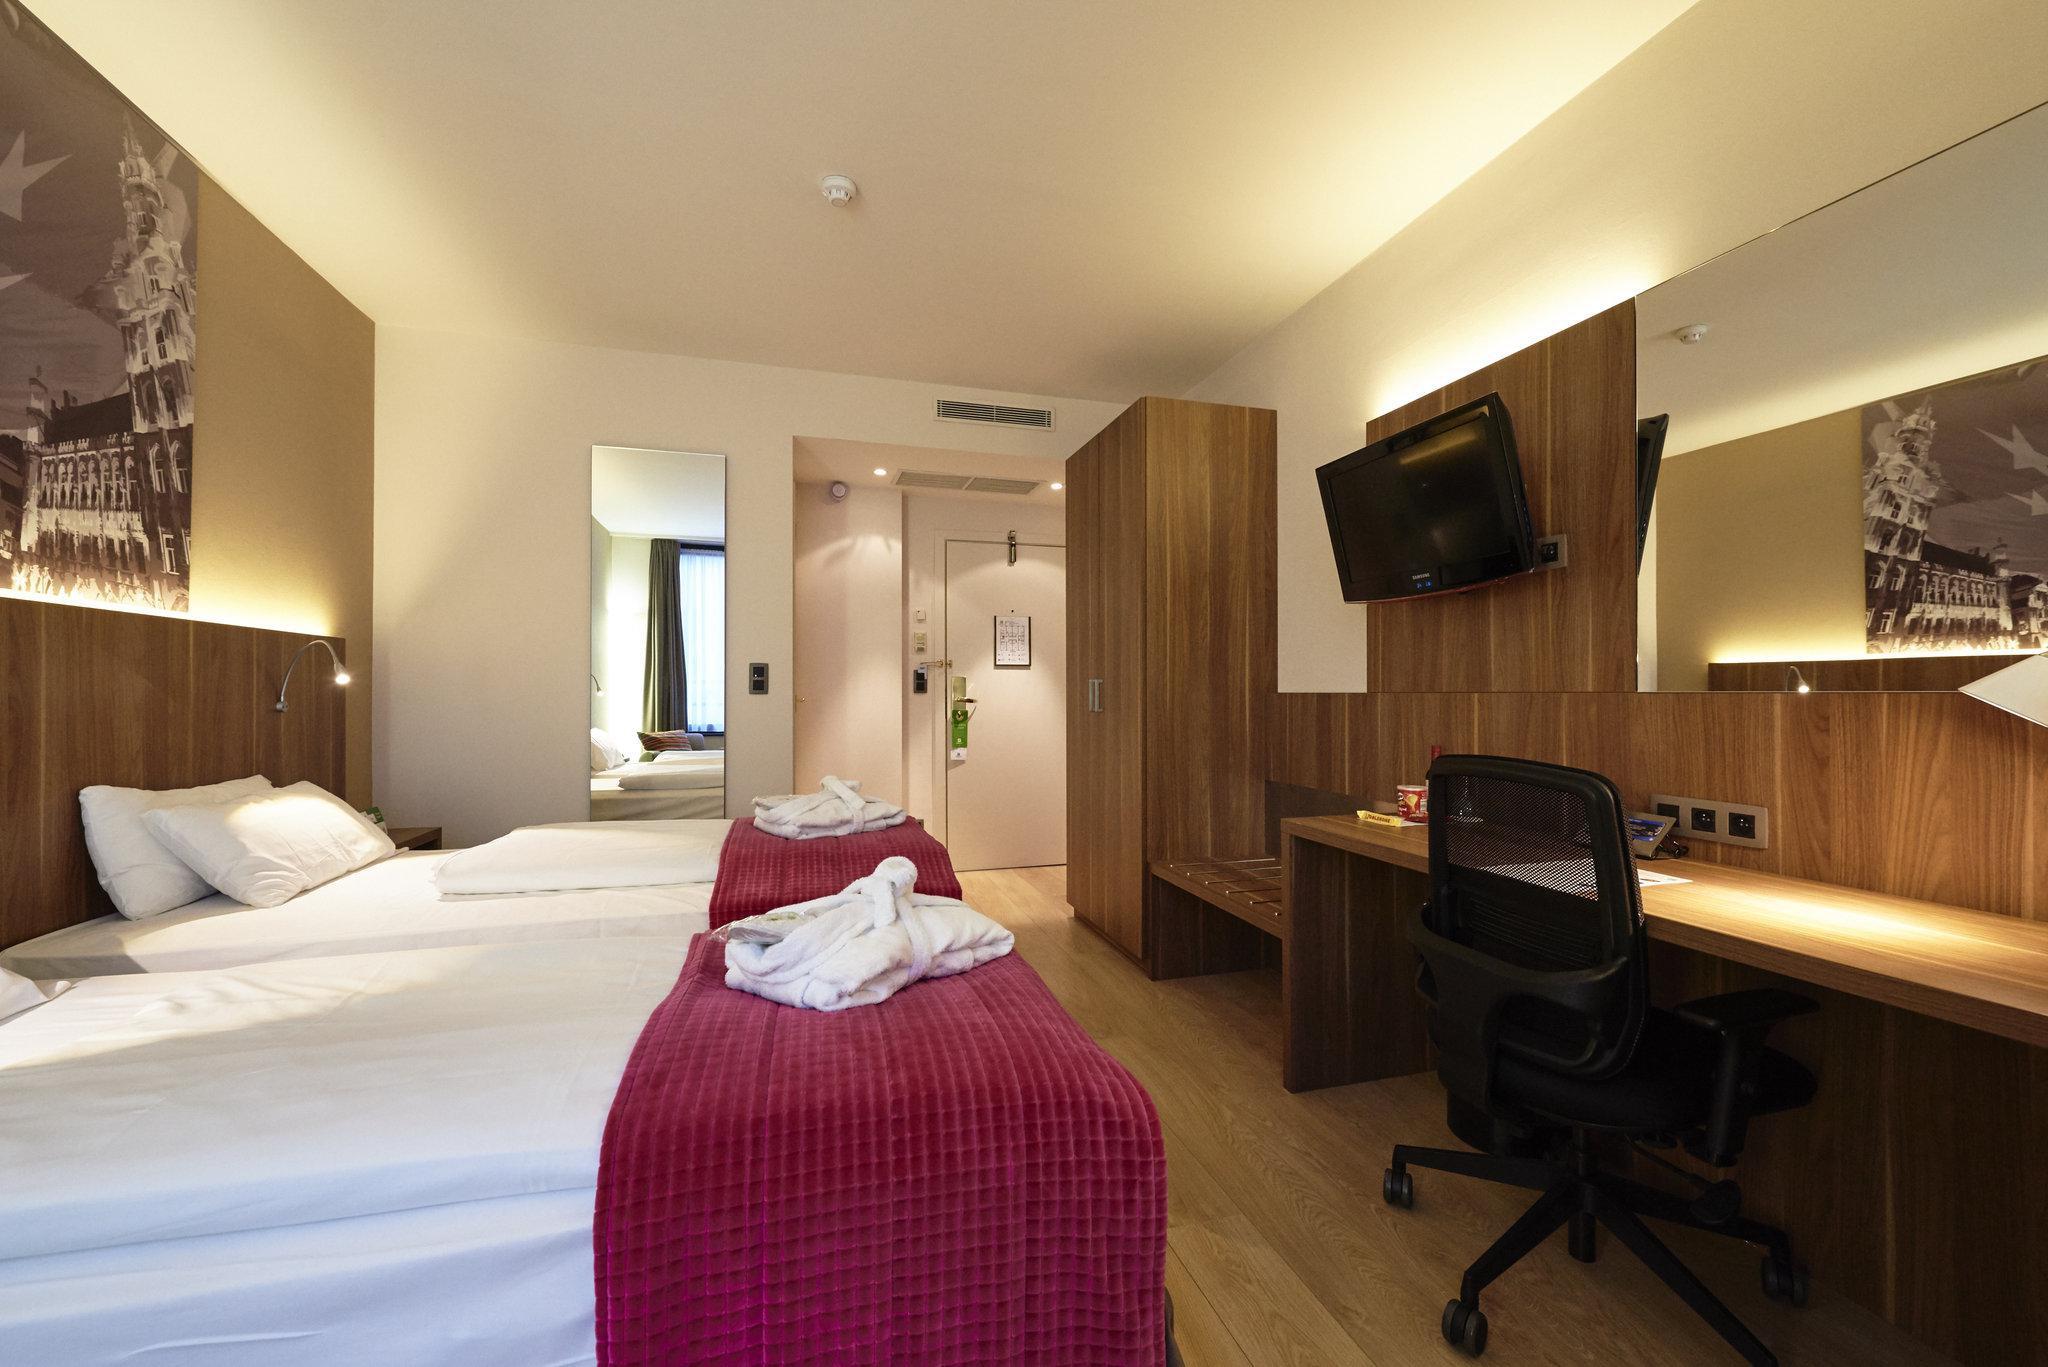 Holiday Inn Brussels Schuman Hotel Di Brussel Skyscanner